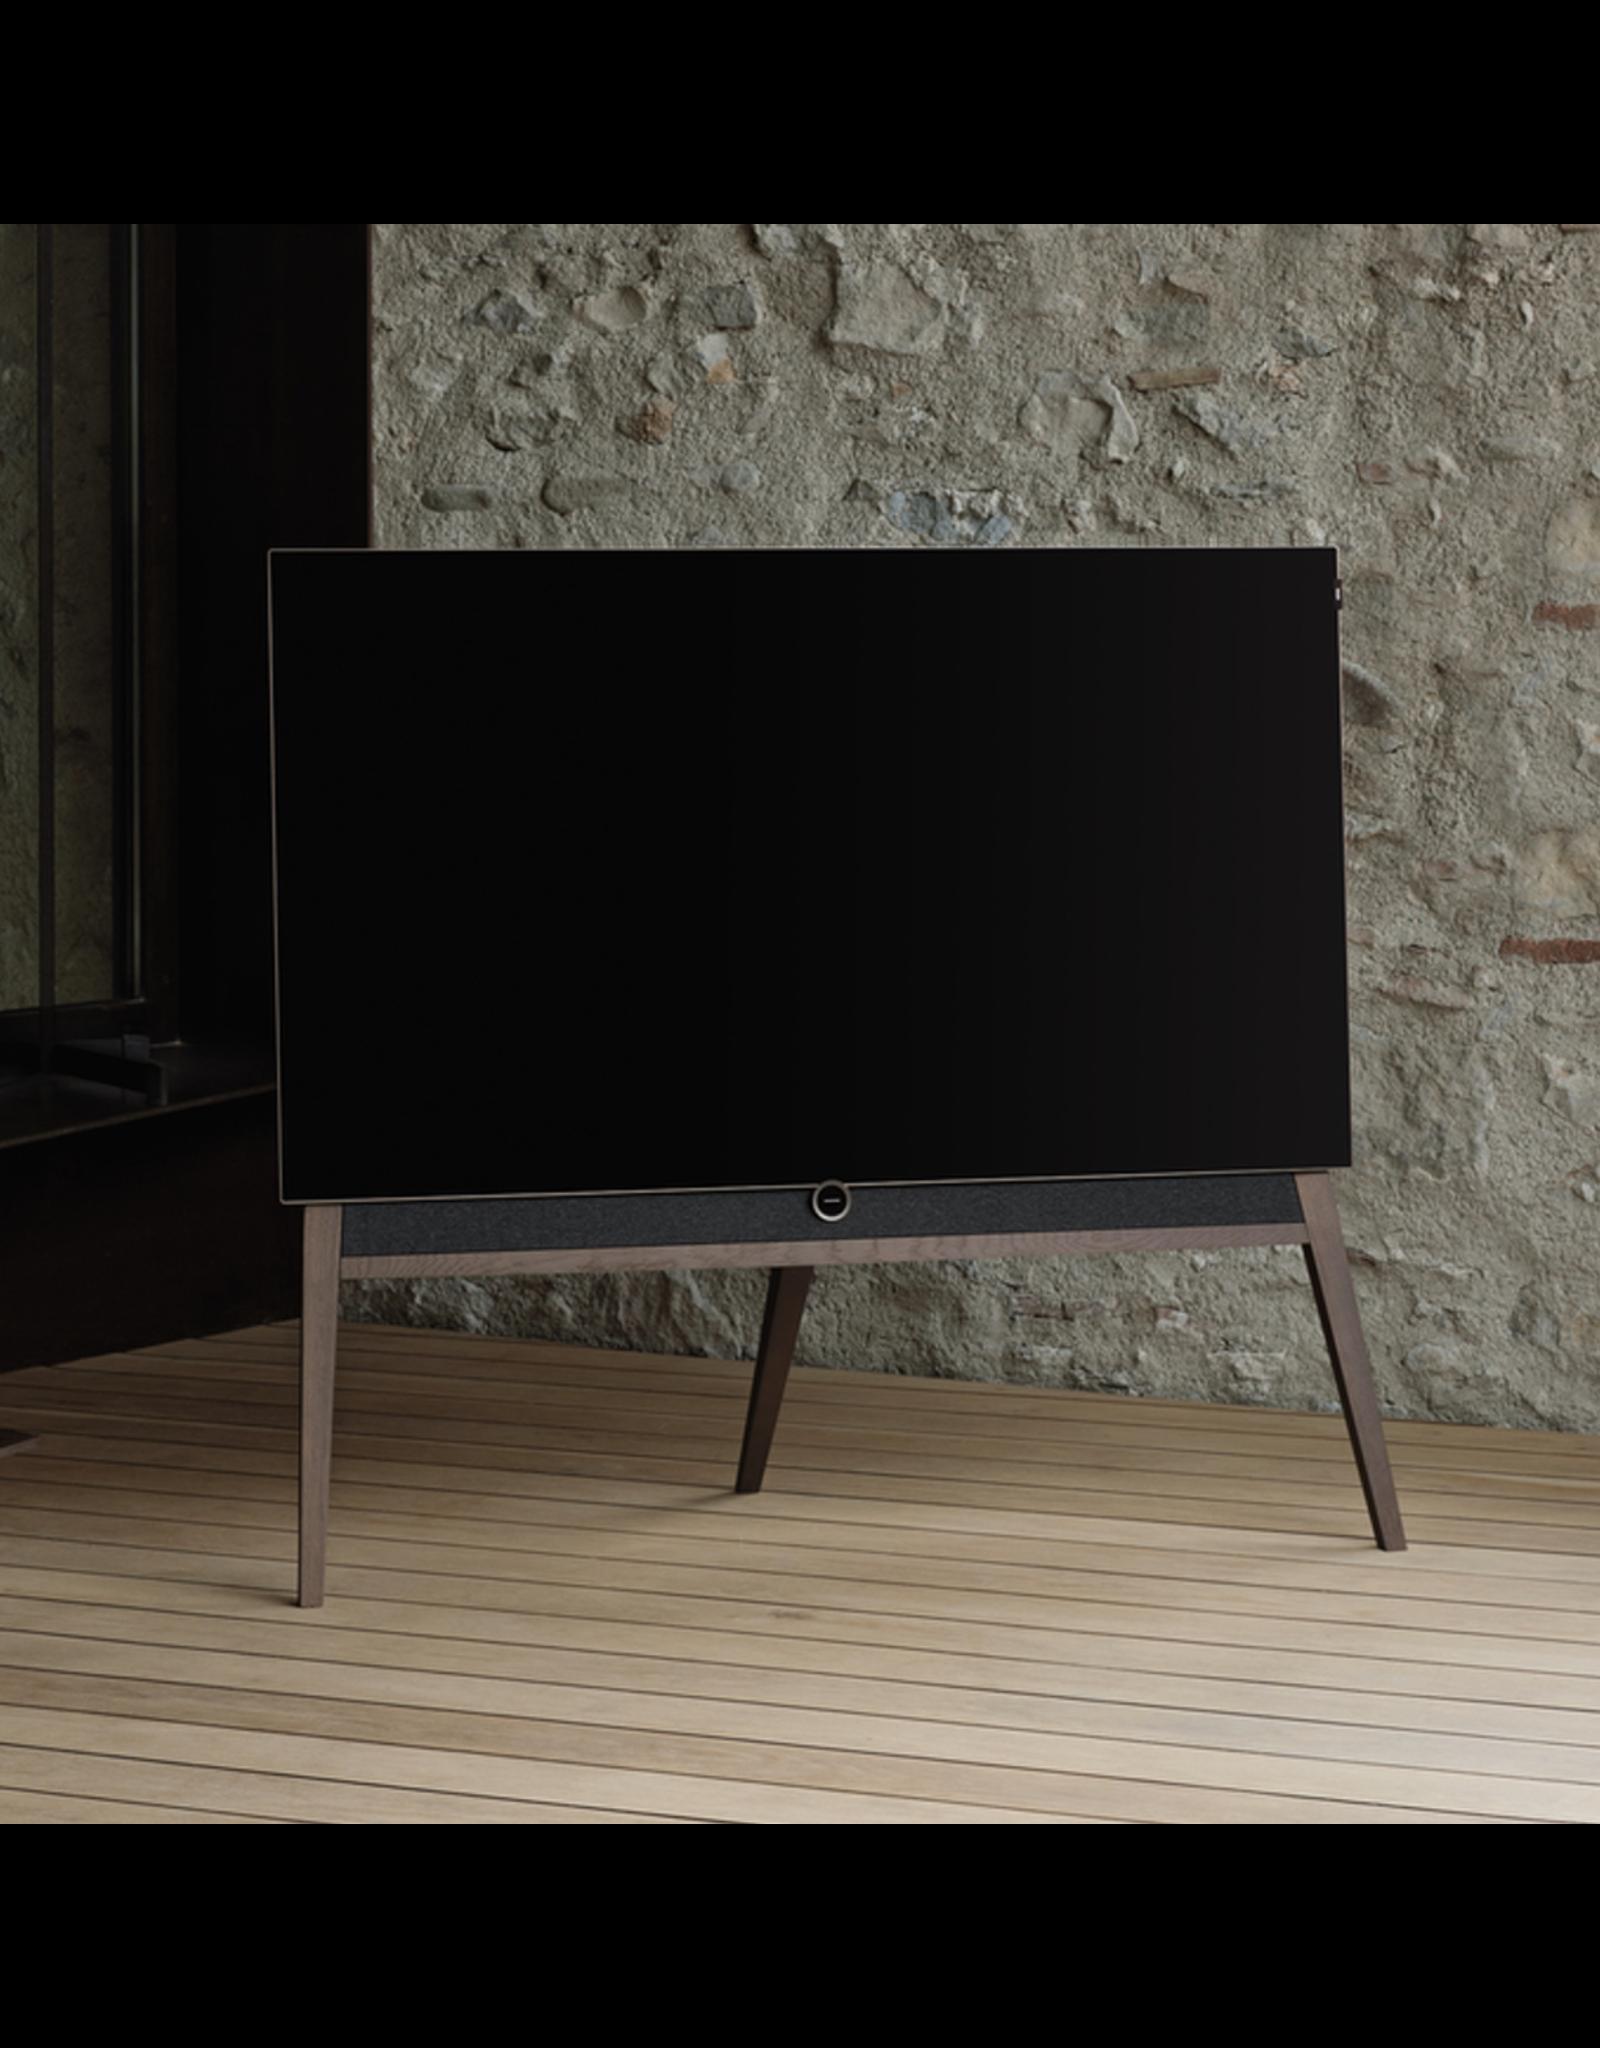 LOEWE LOEWE bild 5.65 DR+ UHD OLED Television w/Oak Floor Stand